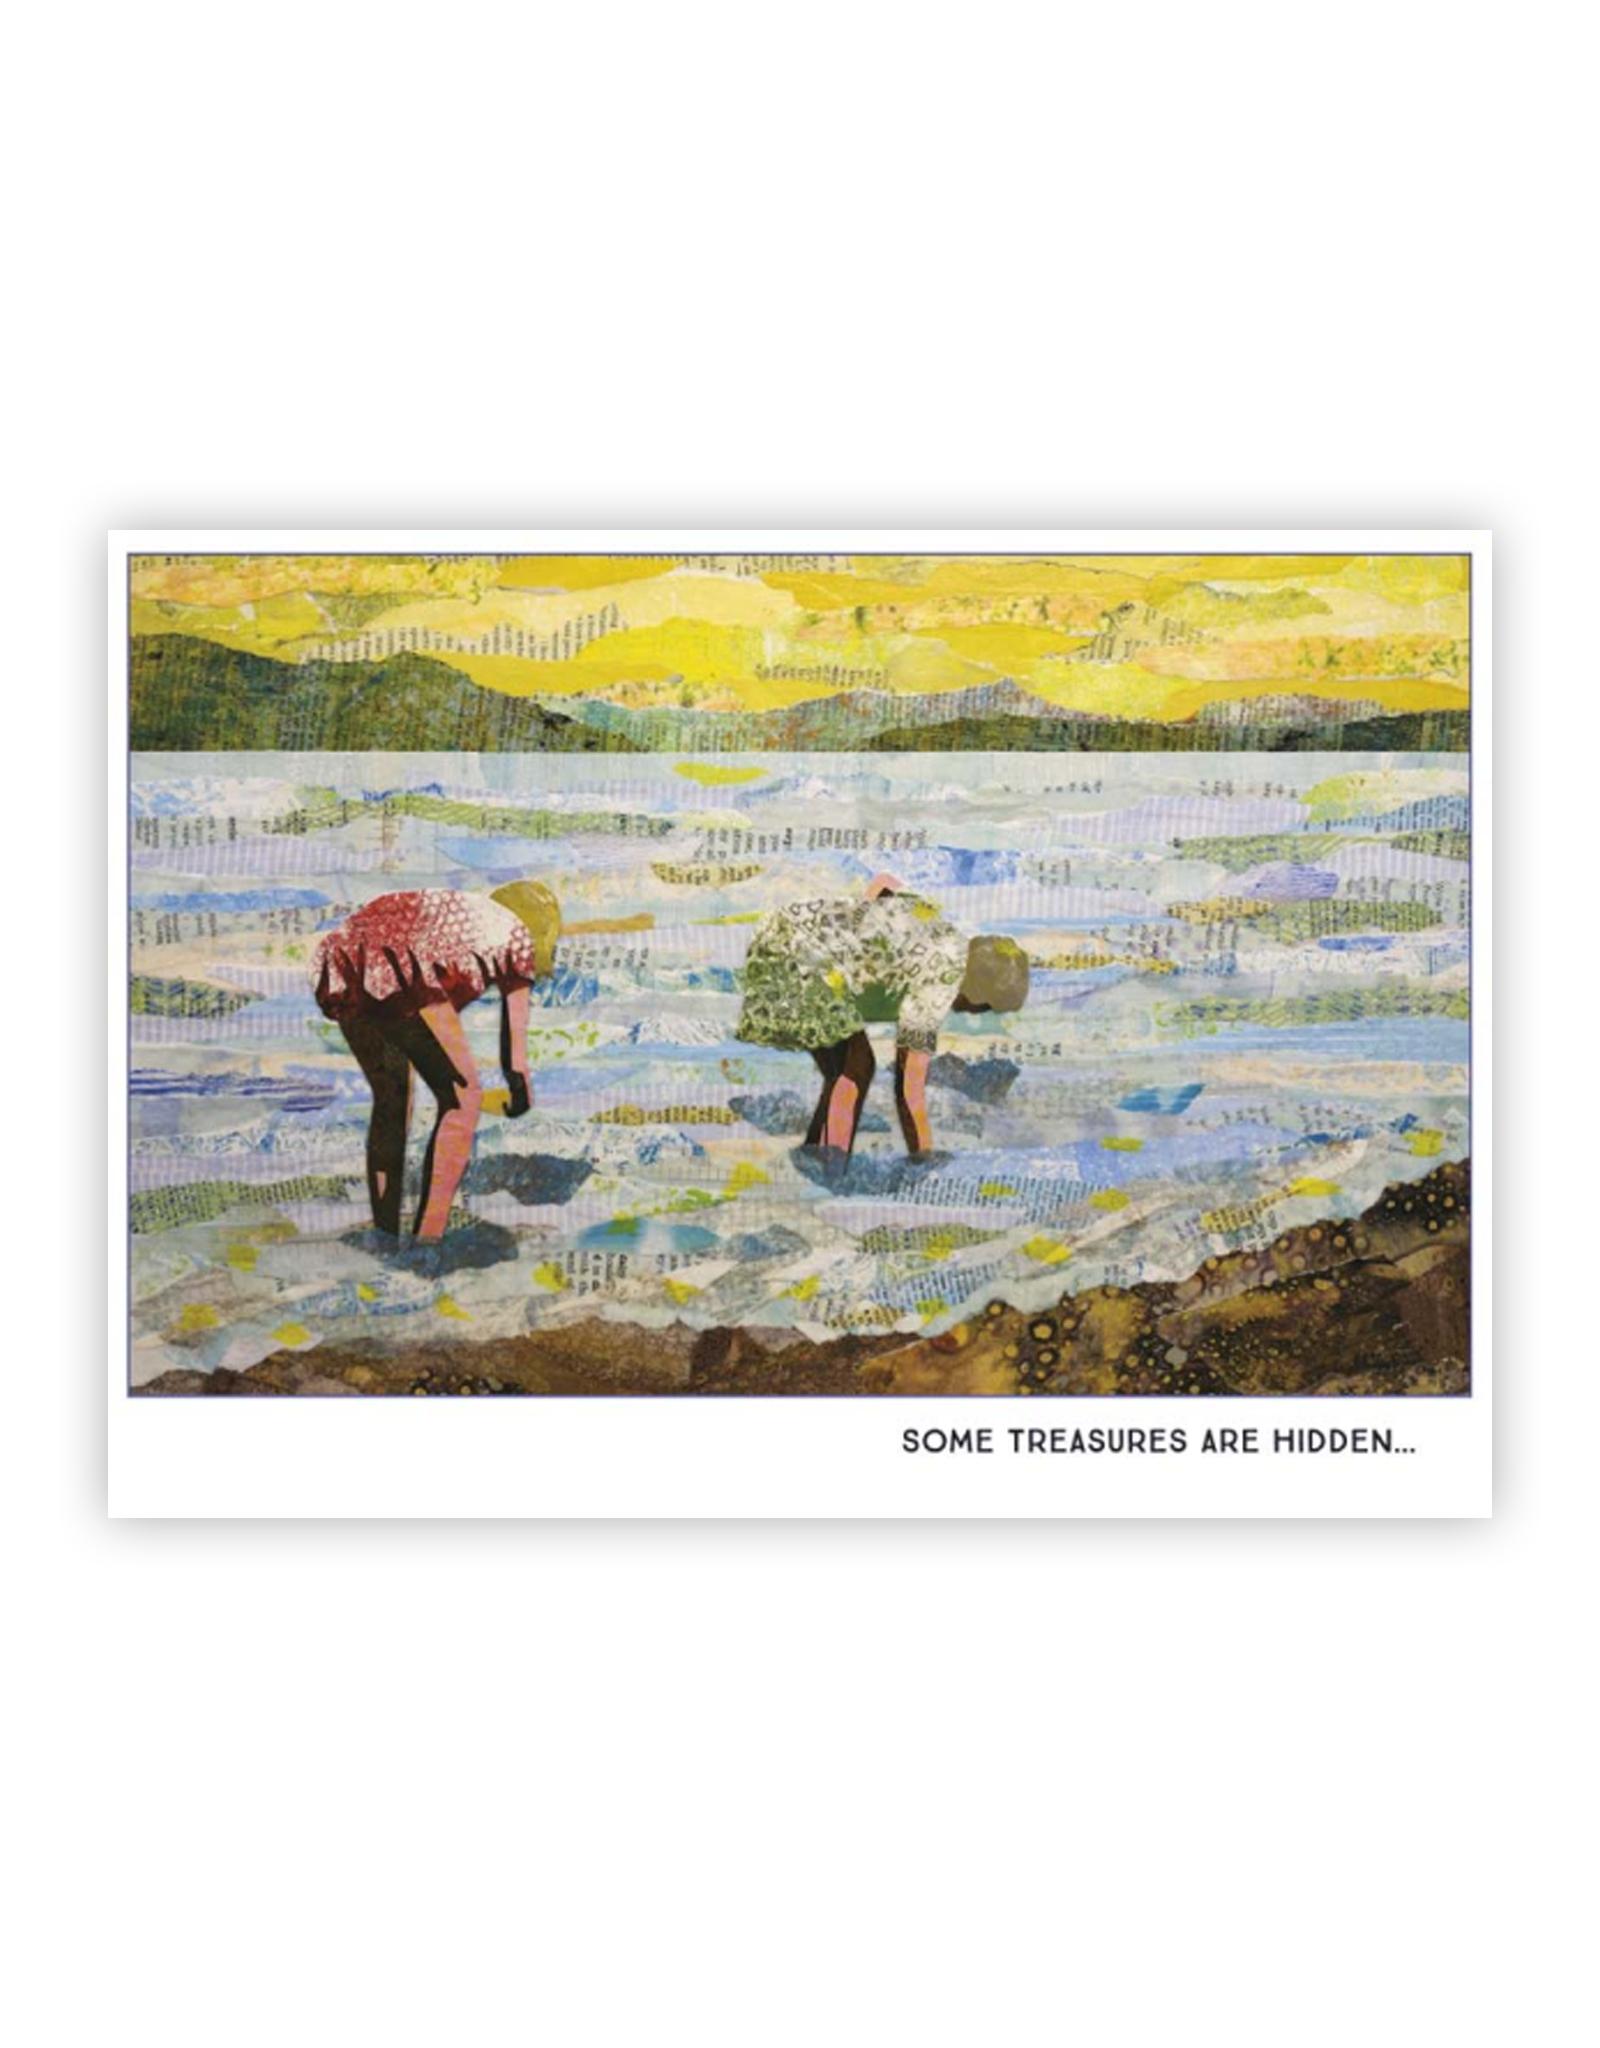 Treasure Hunting Mothers Day Card